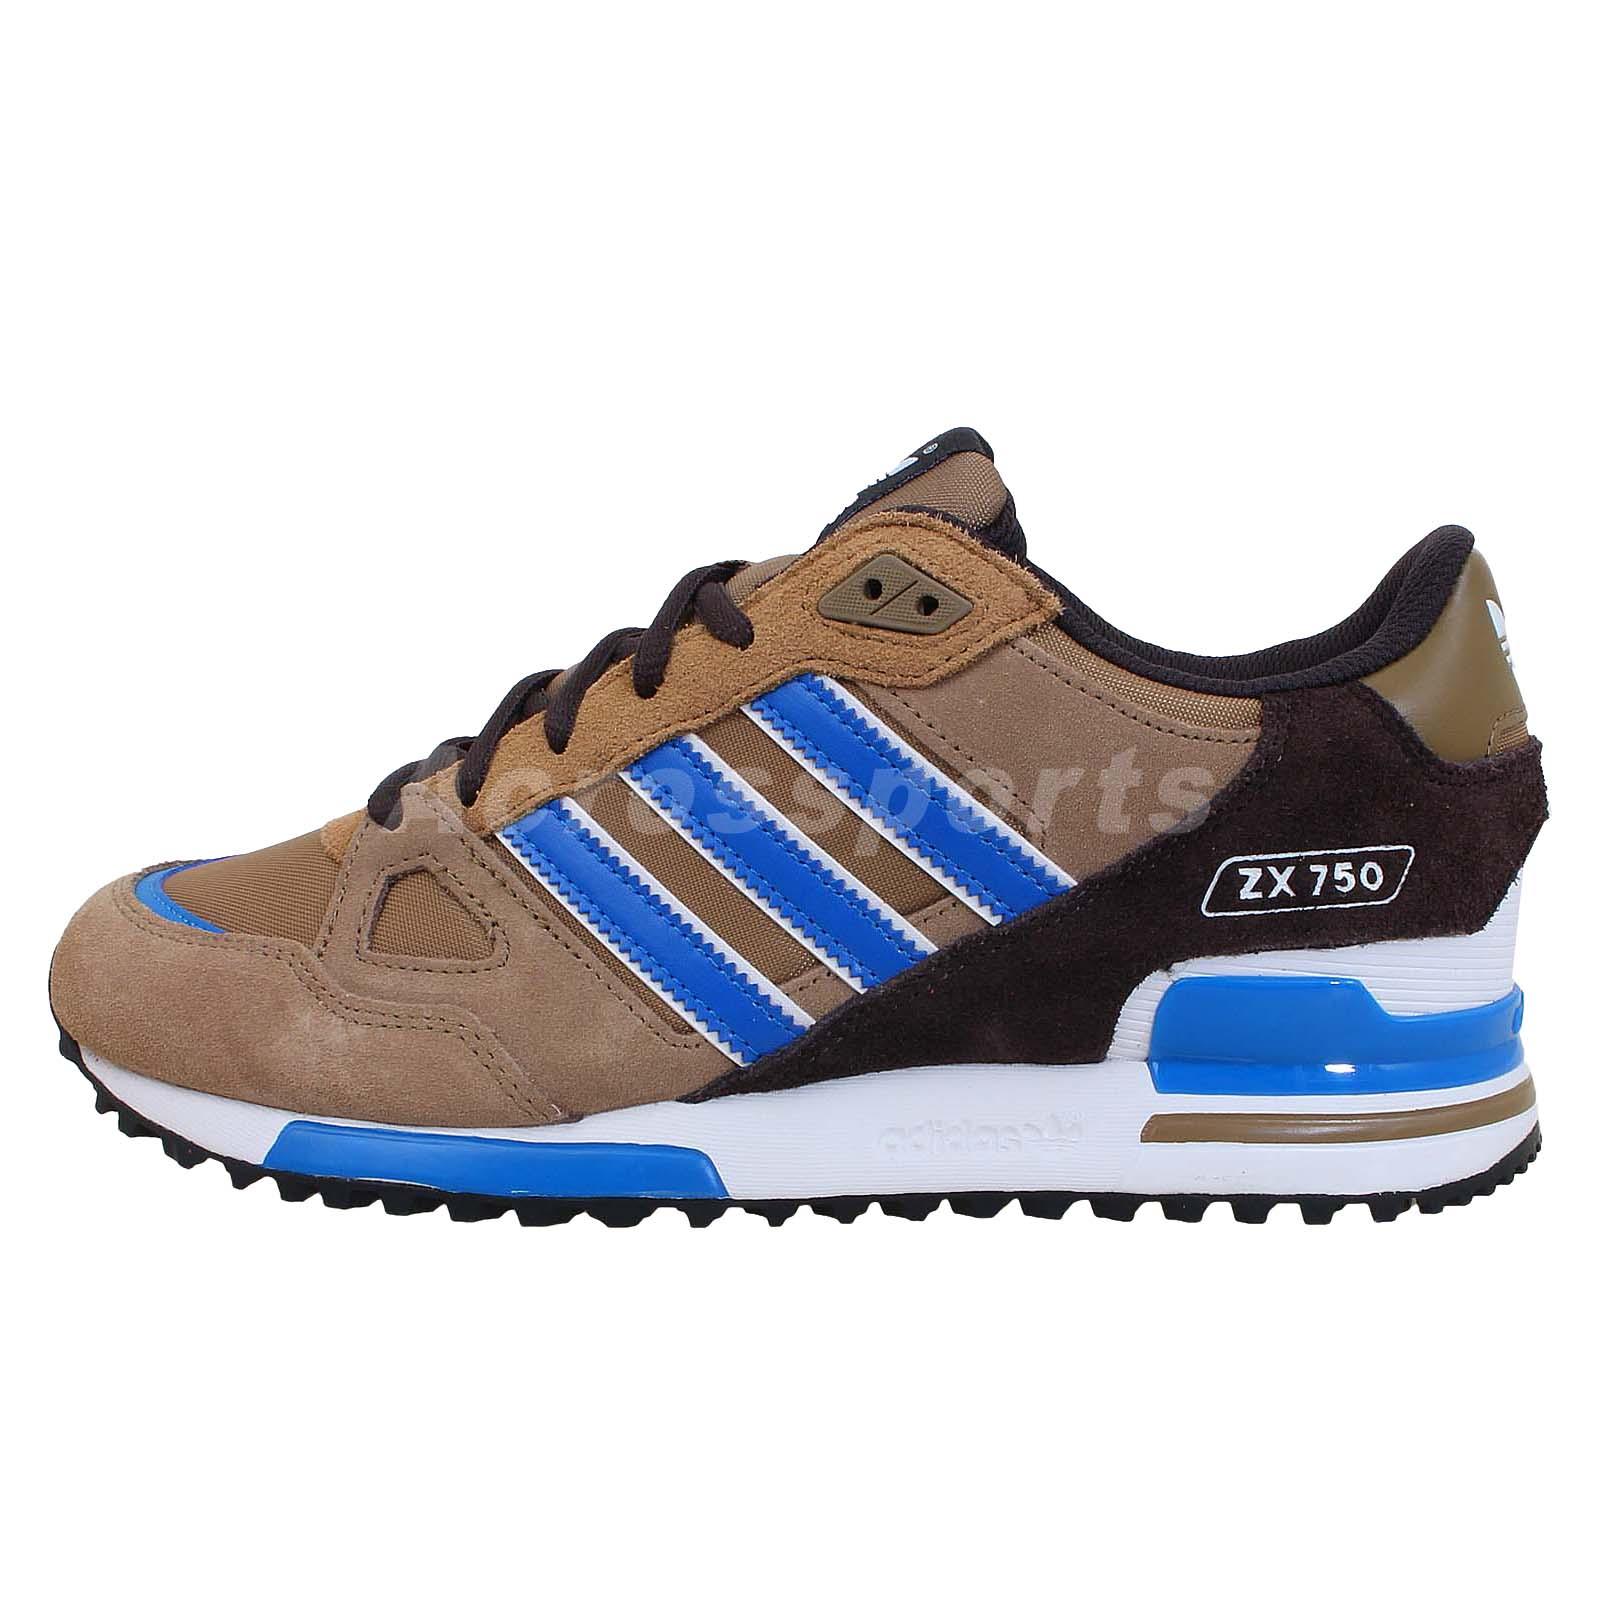 adidas originals zx 750 brown blue black 2014 mens retro